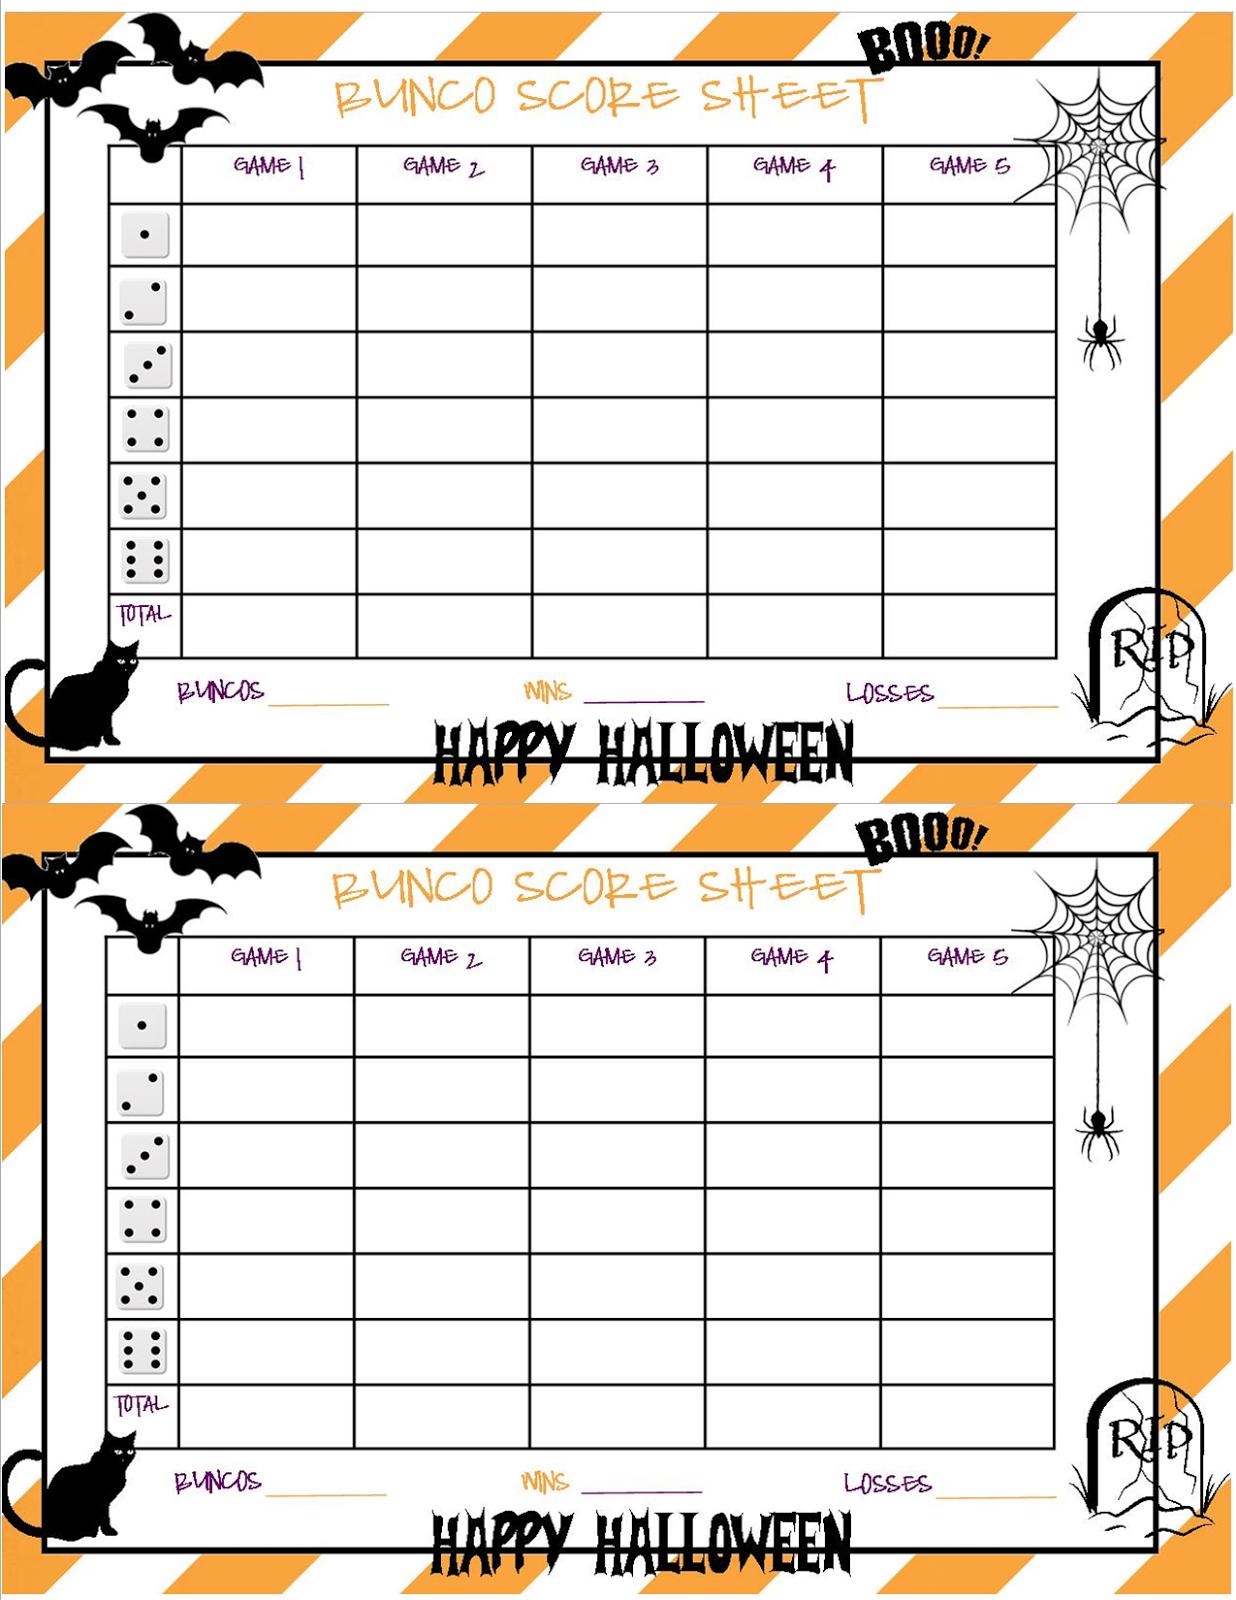 Recipes From Stephanie: Halloween Bunco Sheet - Free Printable Halloween Bunco Score Sheets